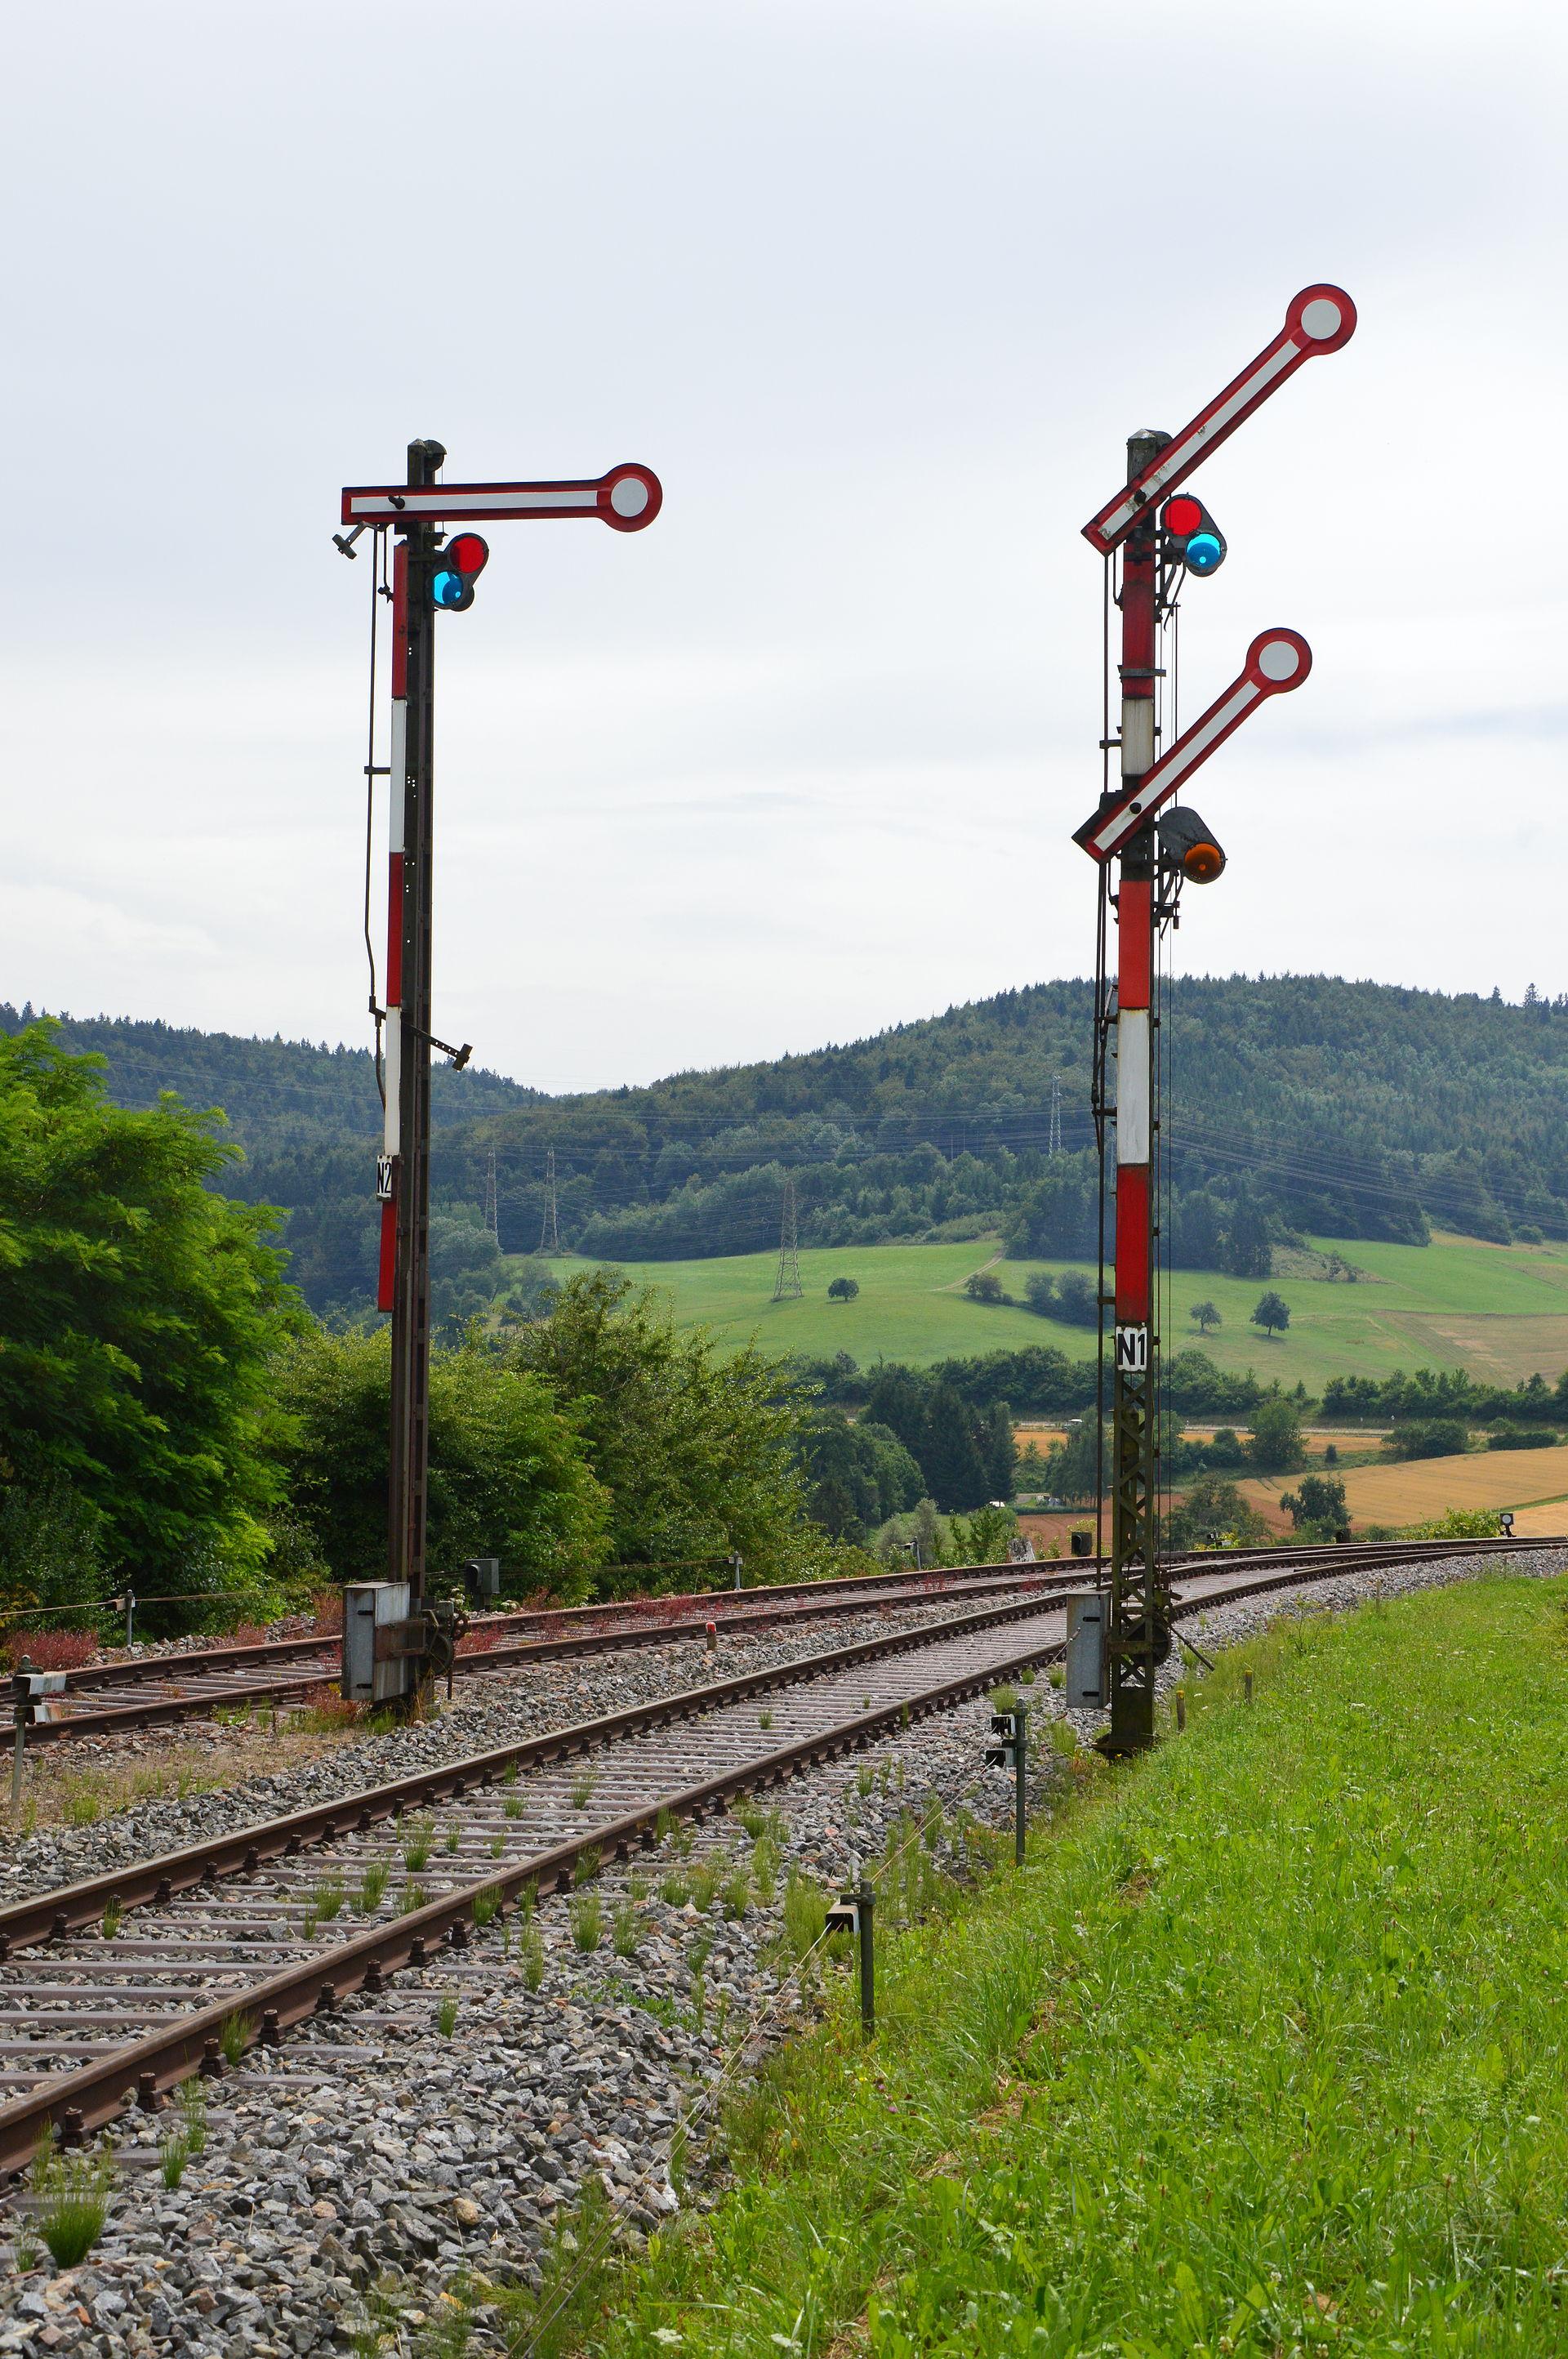 Railway signal wikipedia